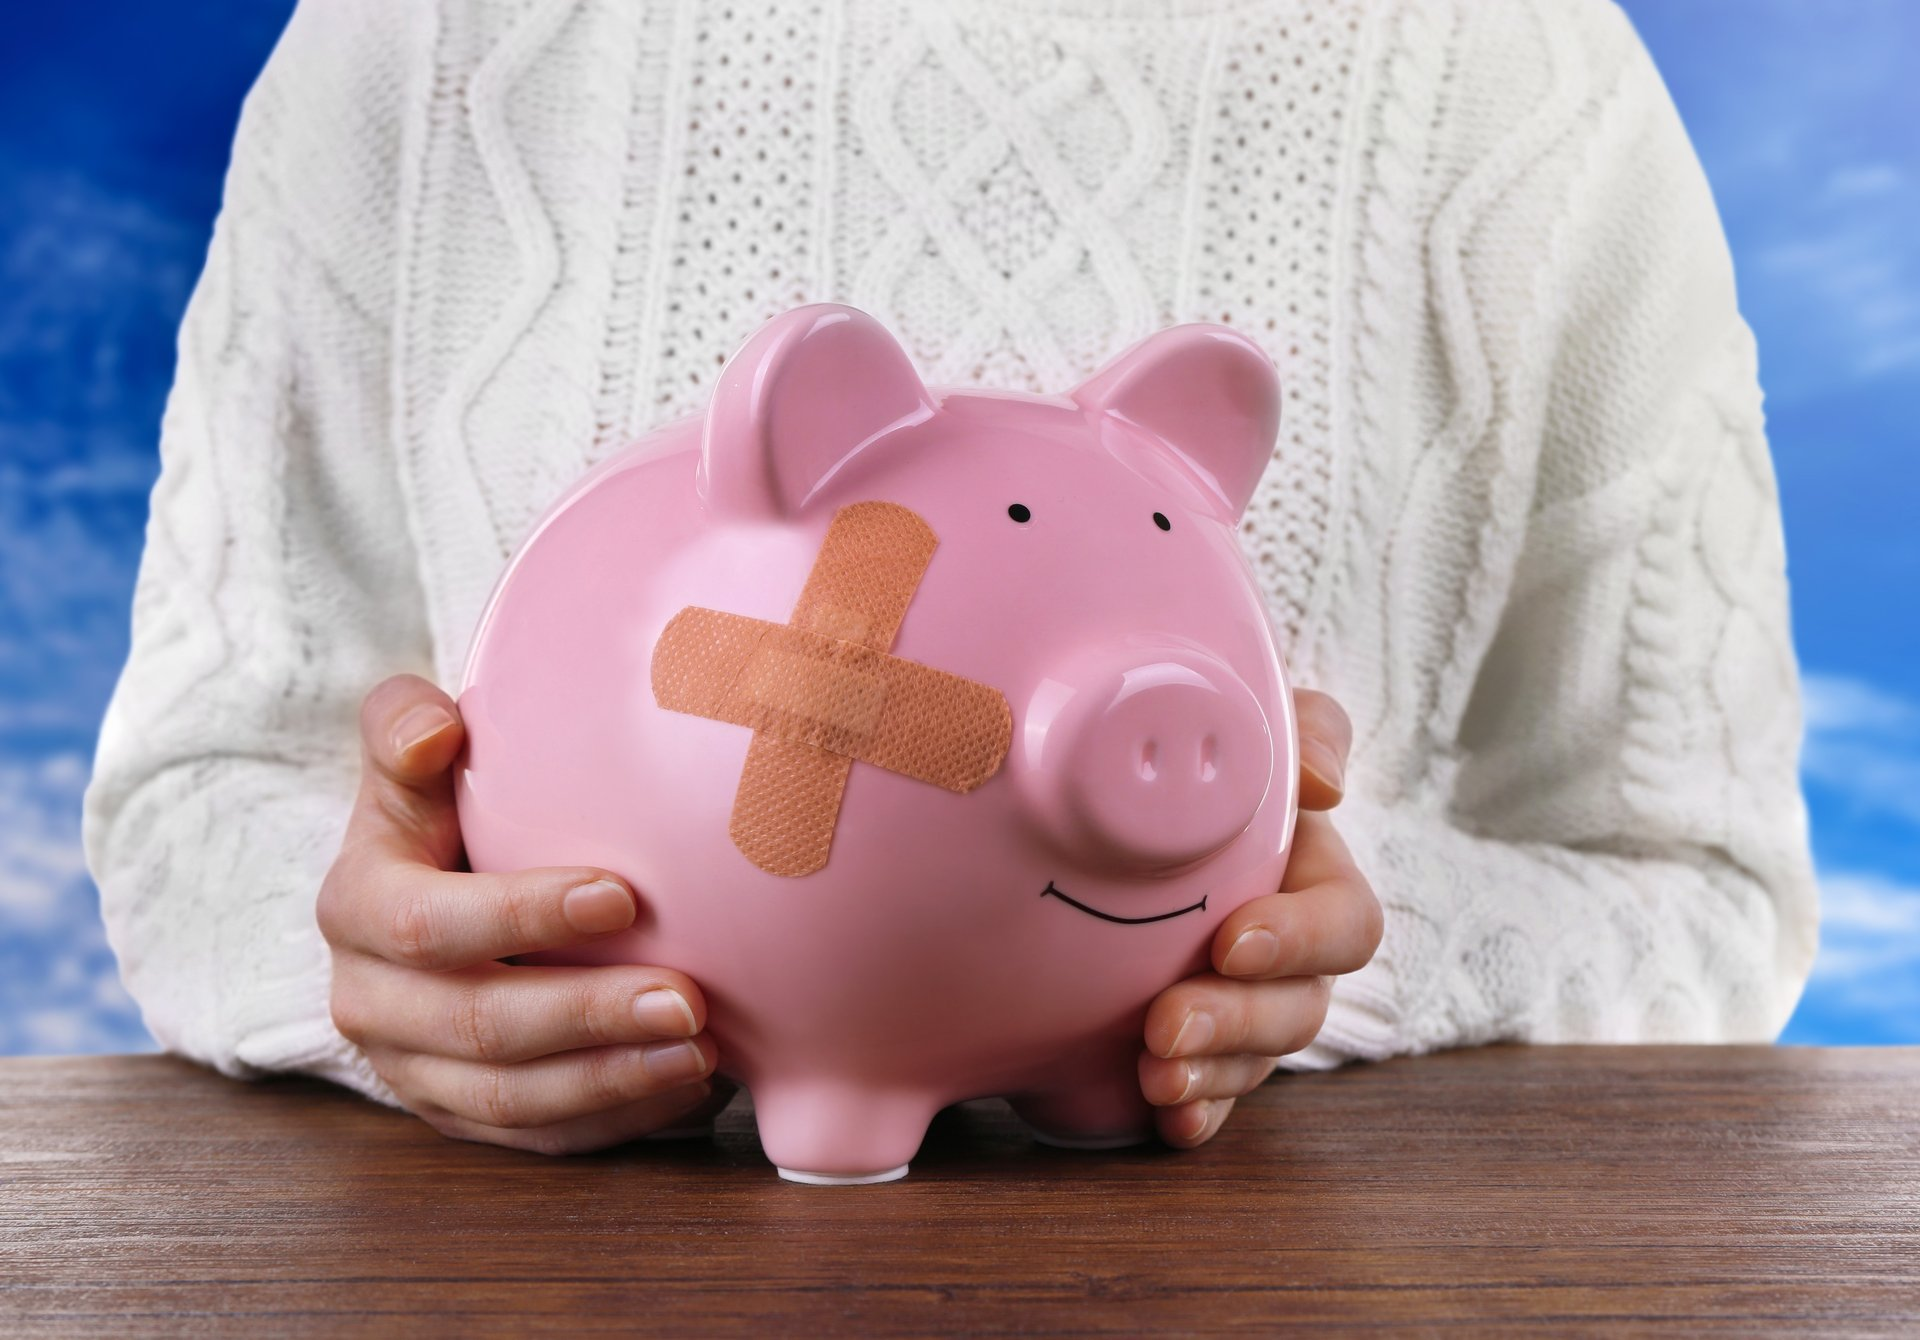 A woman holds a bandaged piggy bank